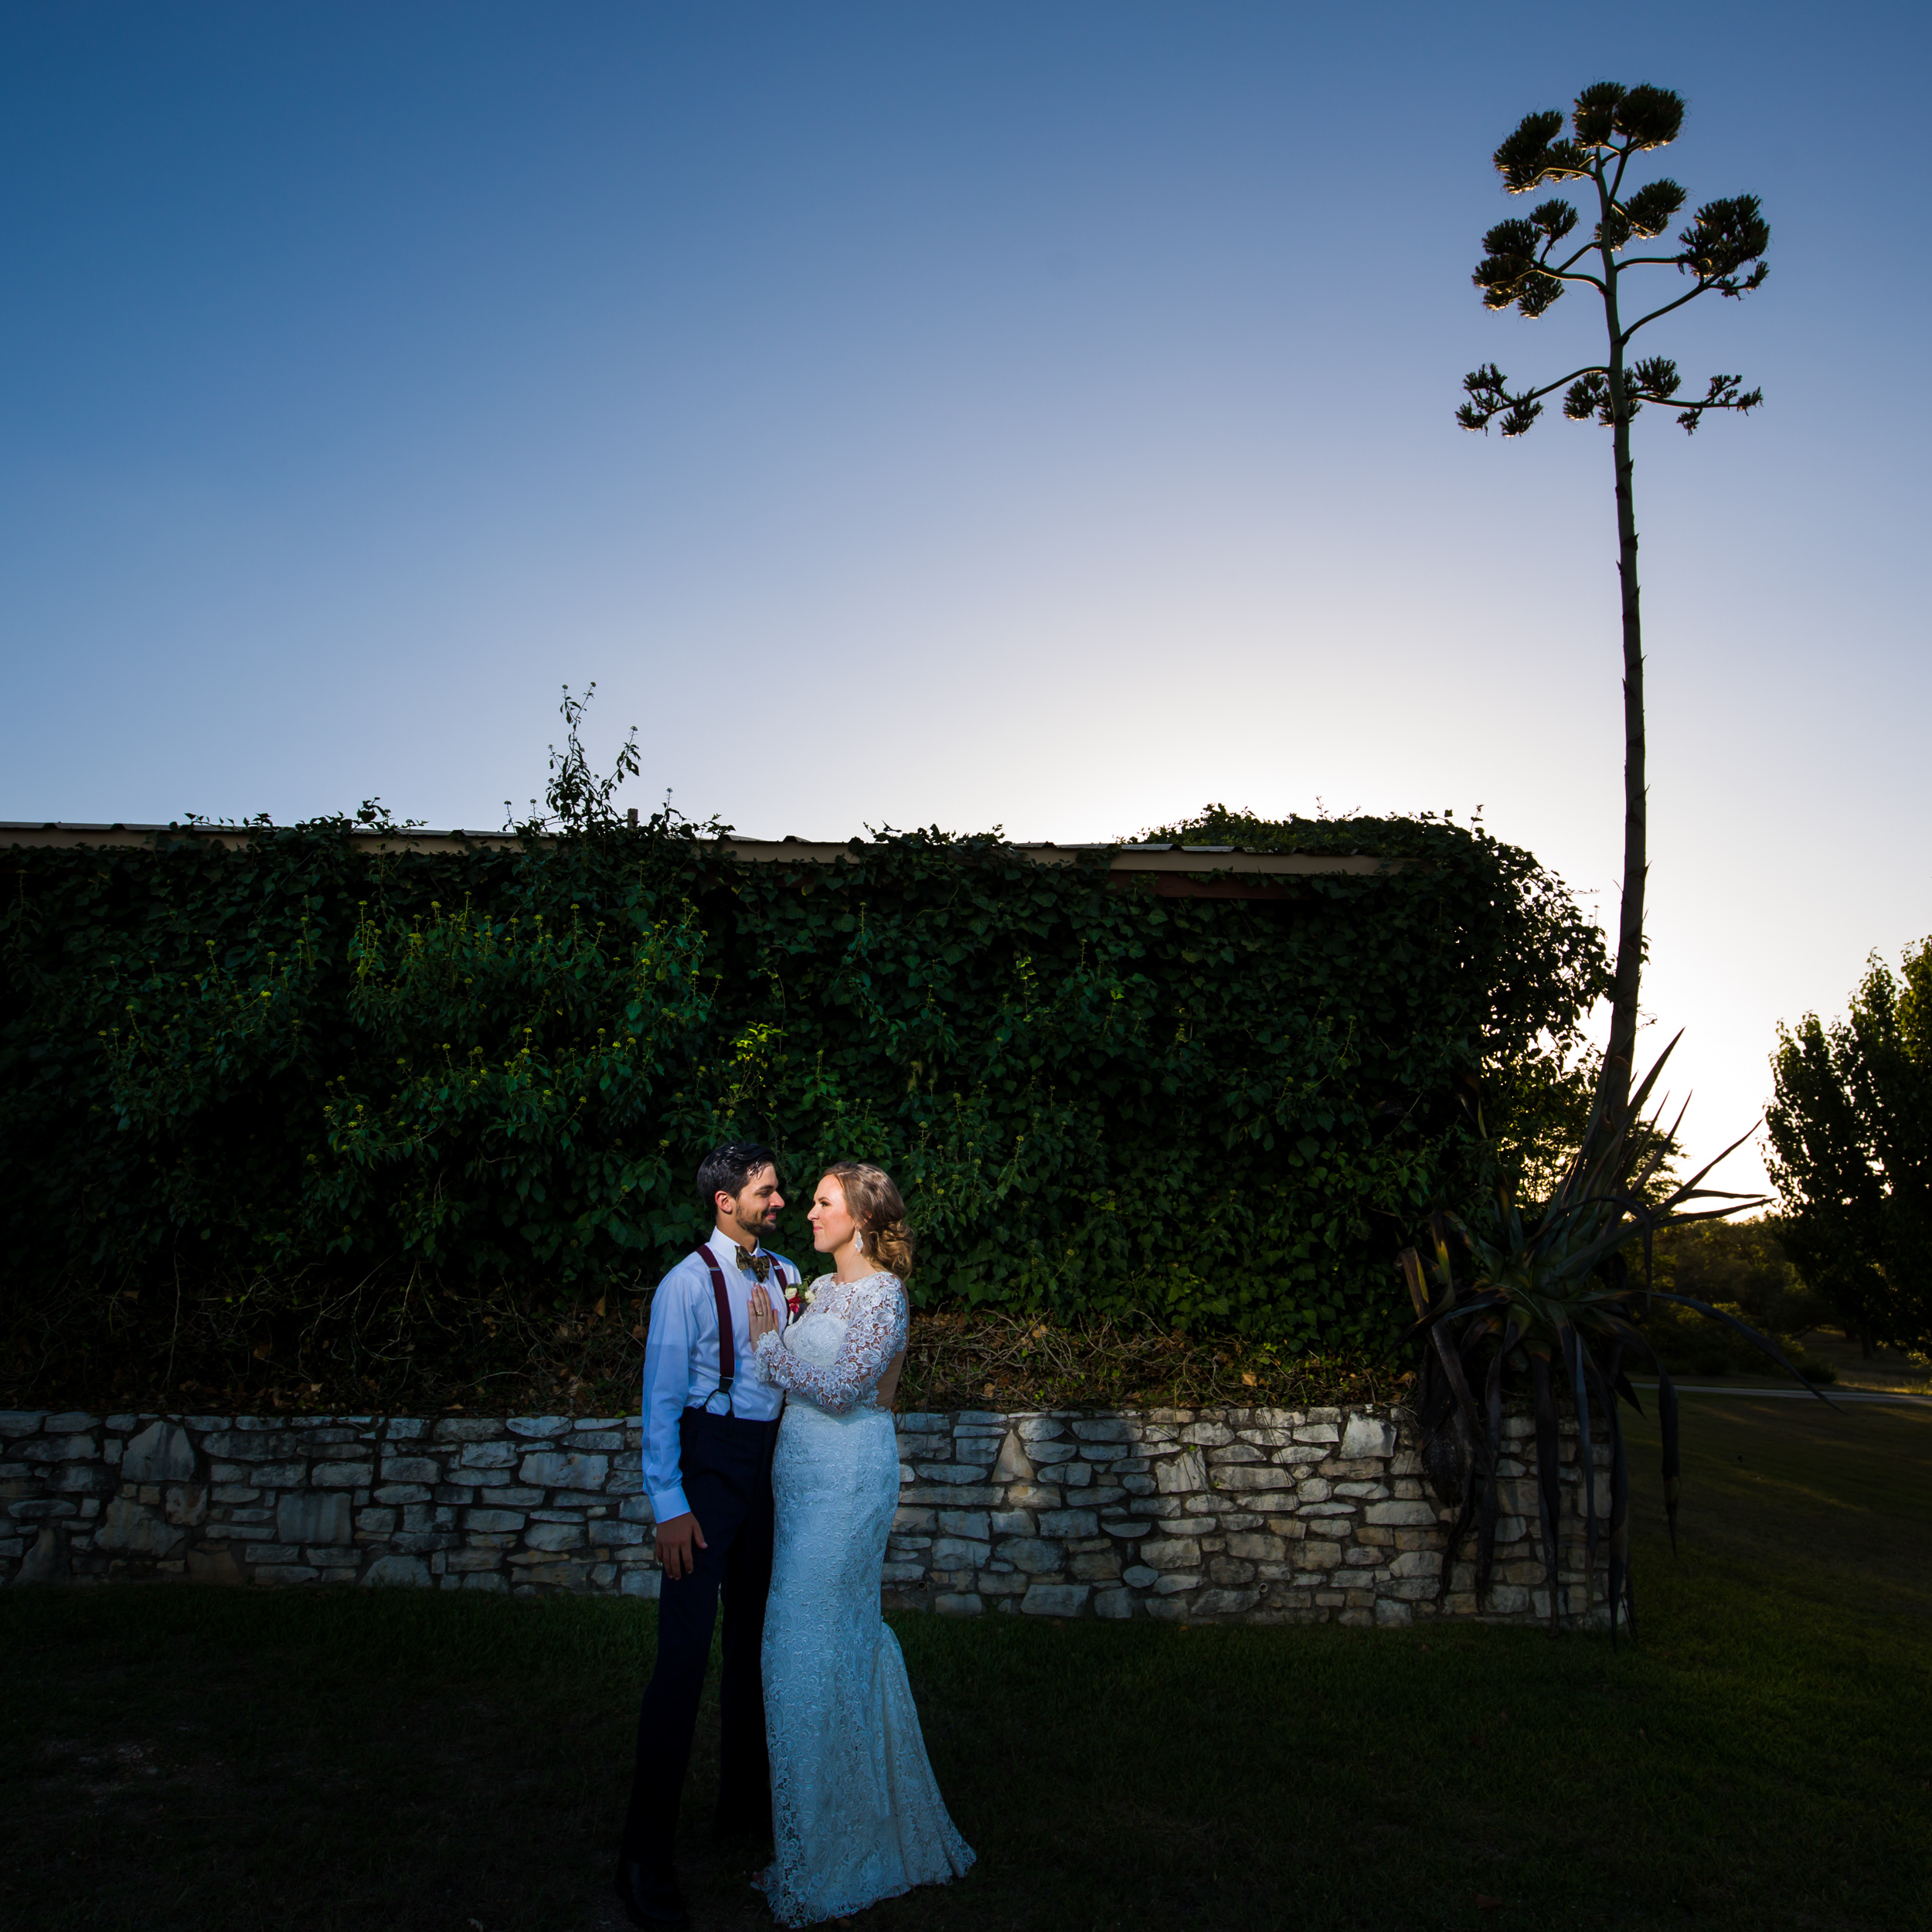 austin-wedding-colorful-38.jpg